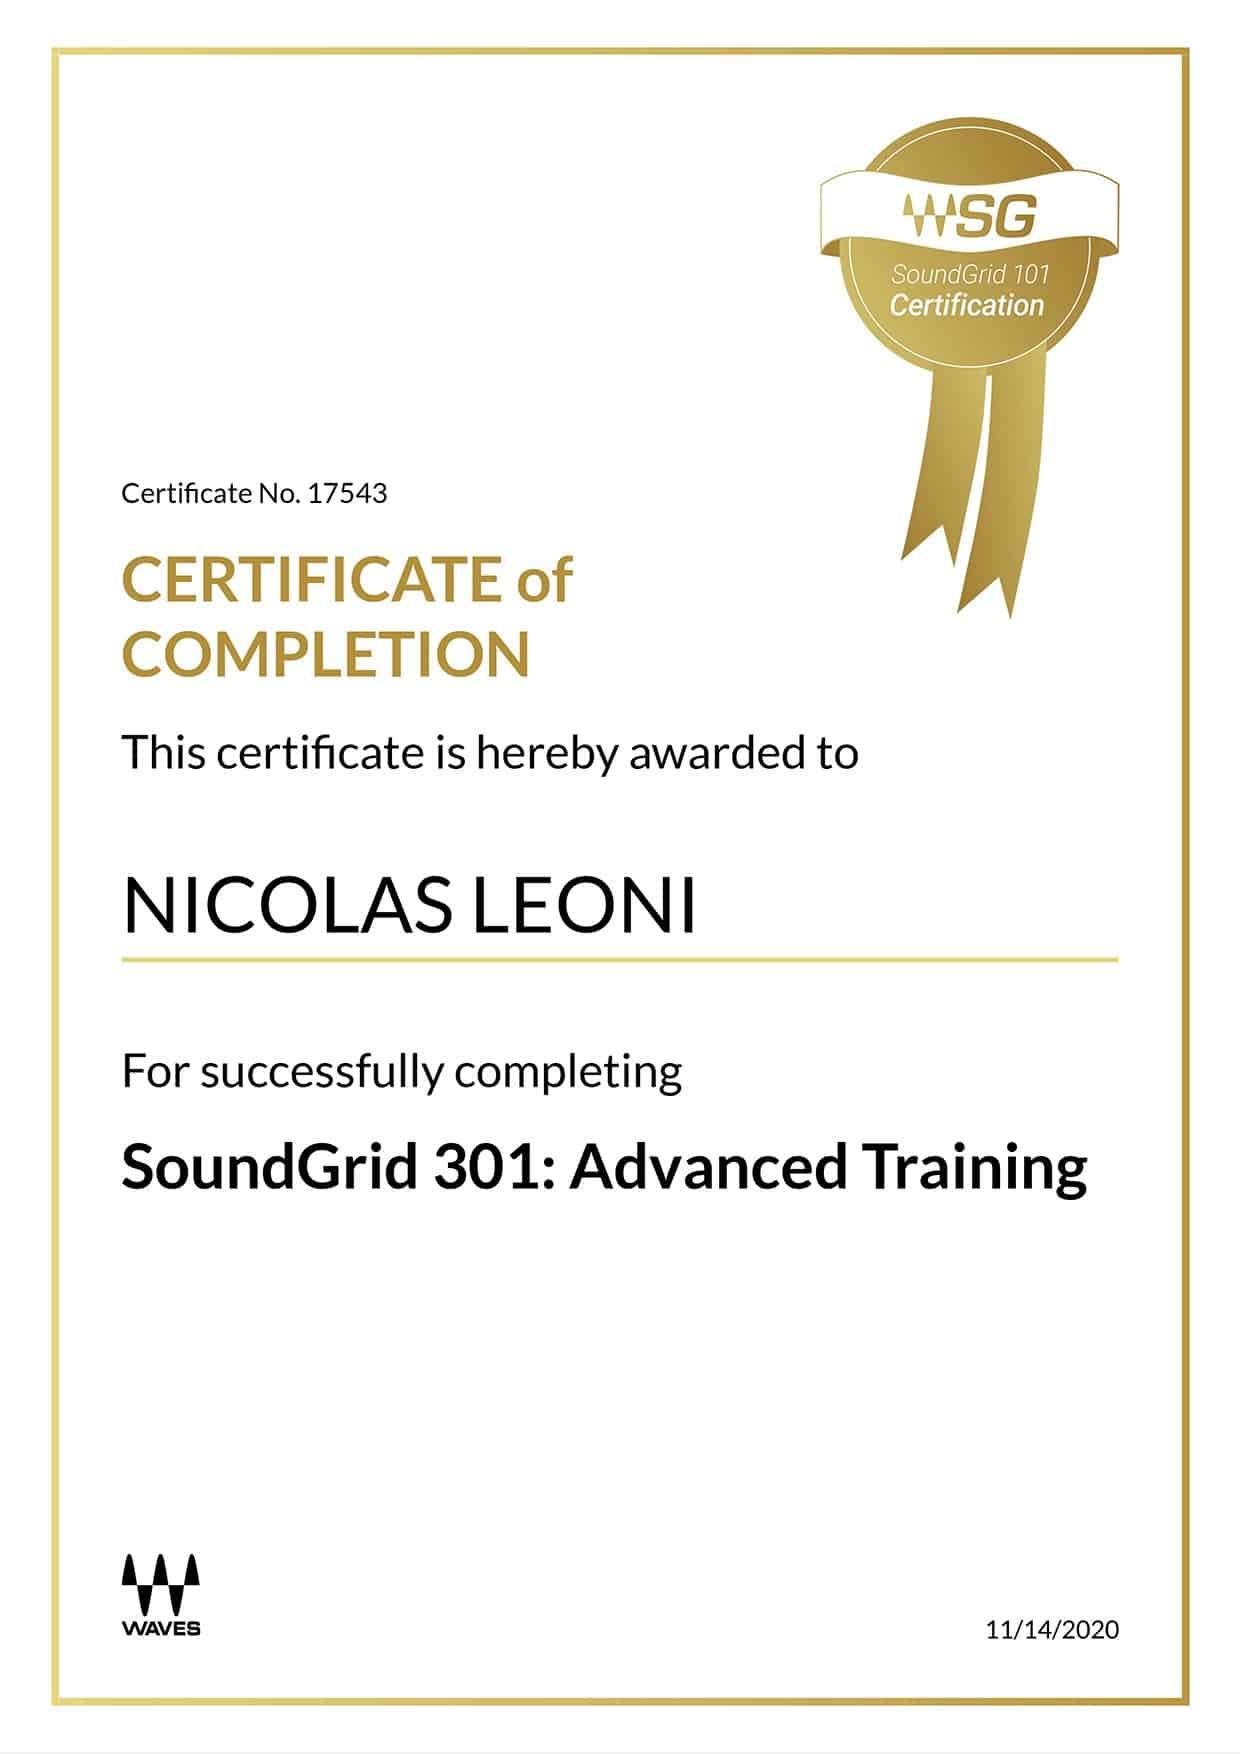 Certificato Waves SoundGrid 301